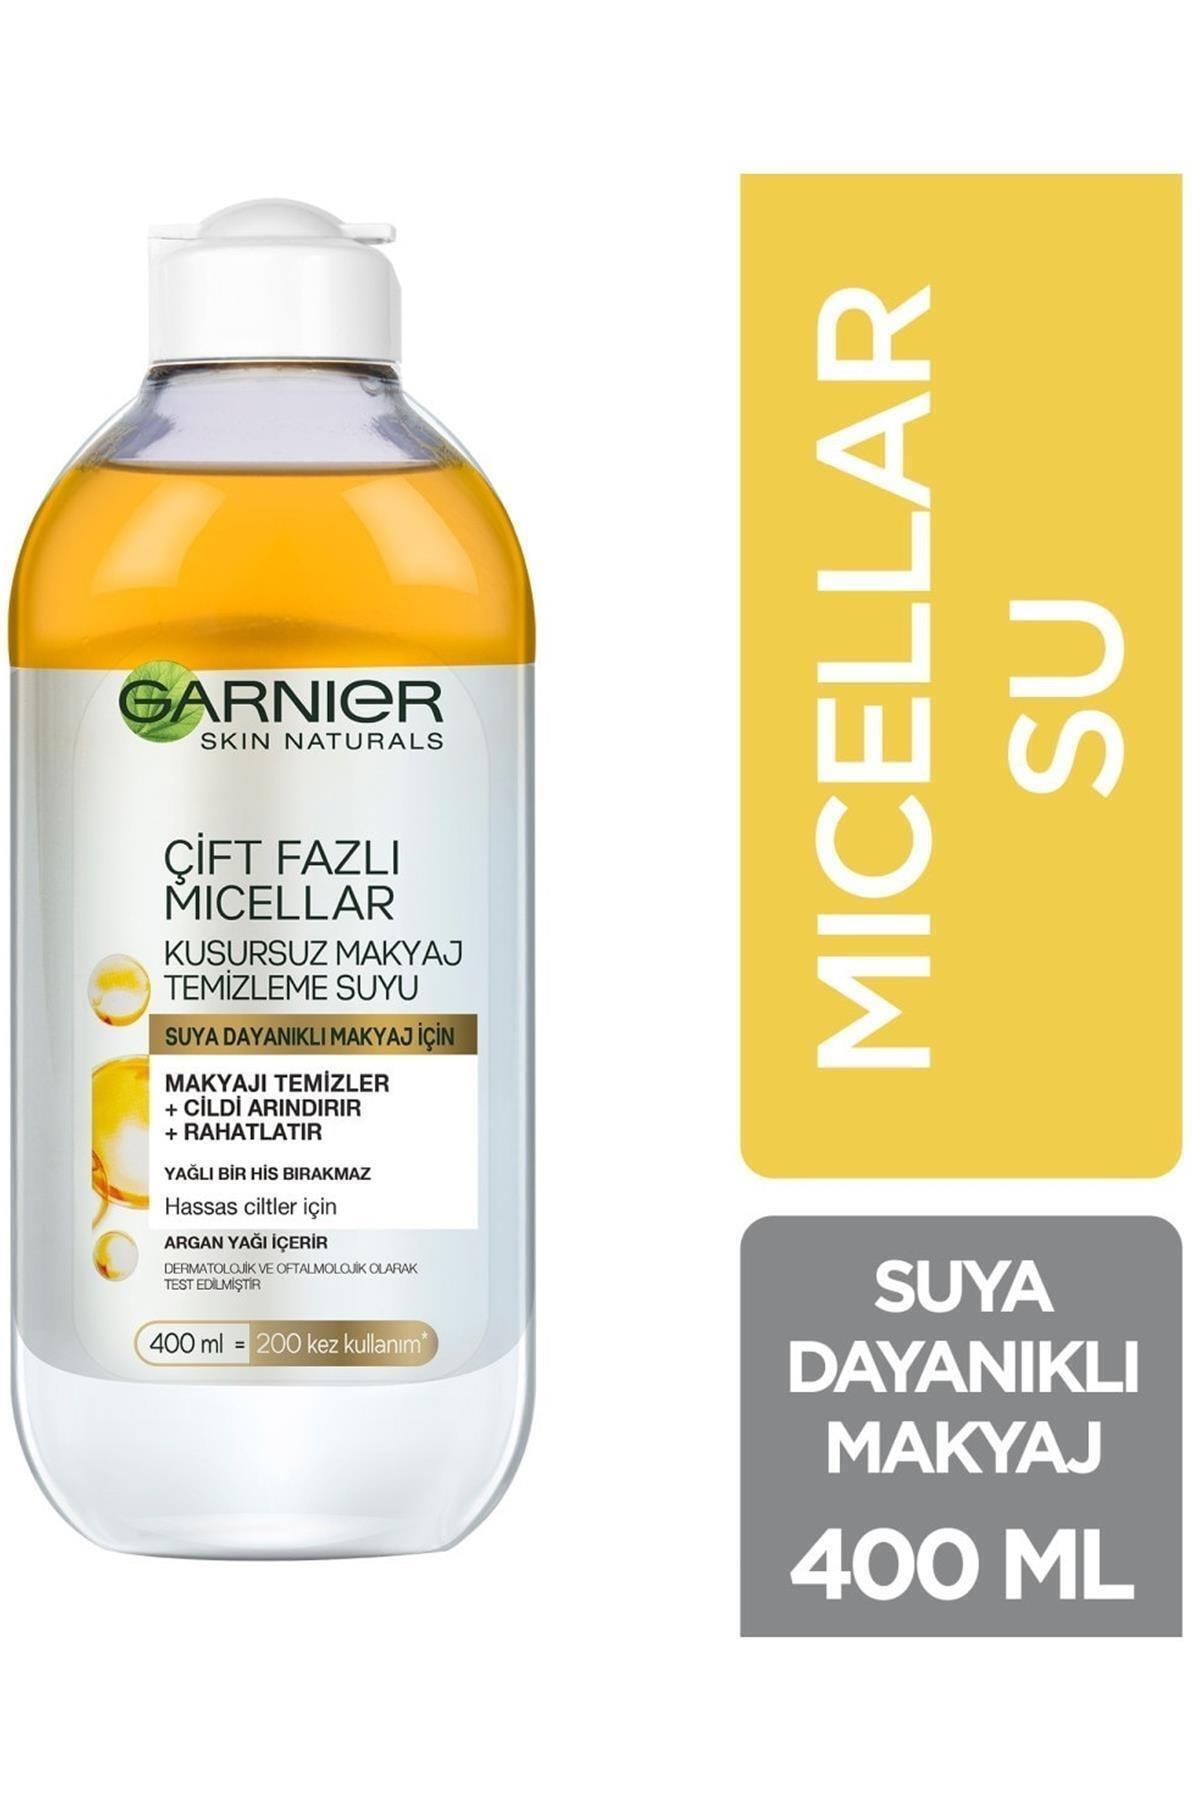 Garnier Micellar Kusursuz Makyaj Temizleme Suyu 400 ml